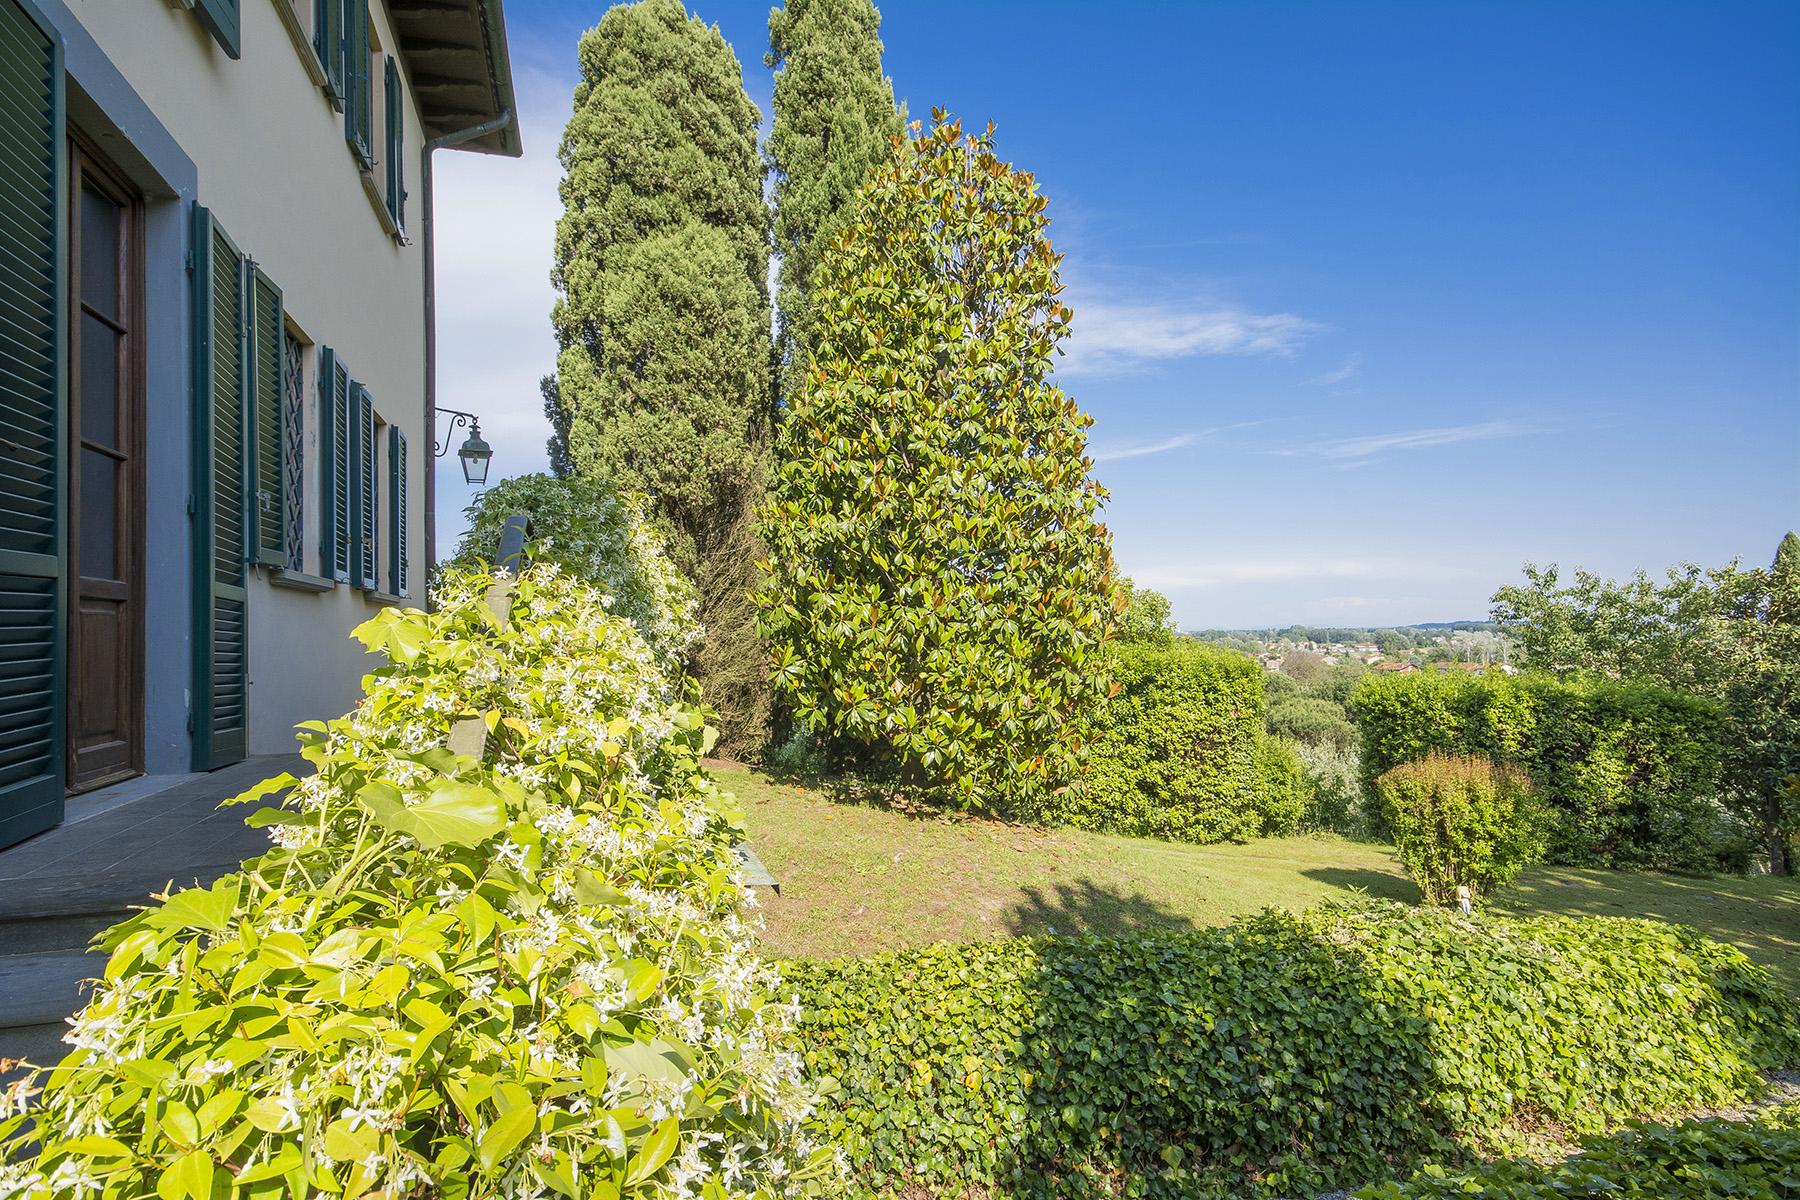 Villa in Vendita a Lucca: 5 locali, 600 mq - Foto 27